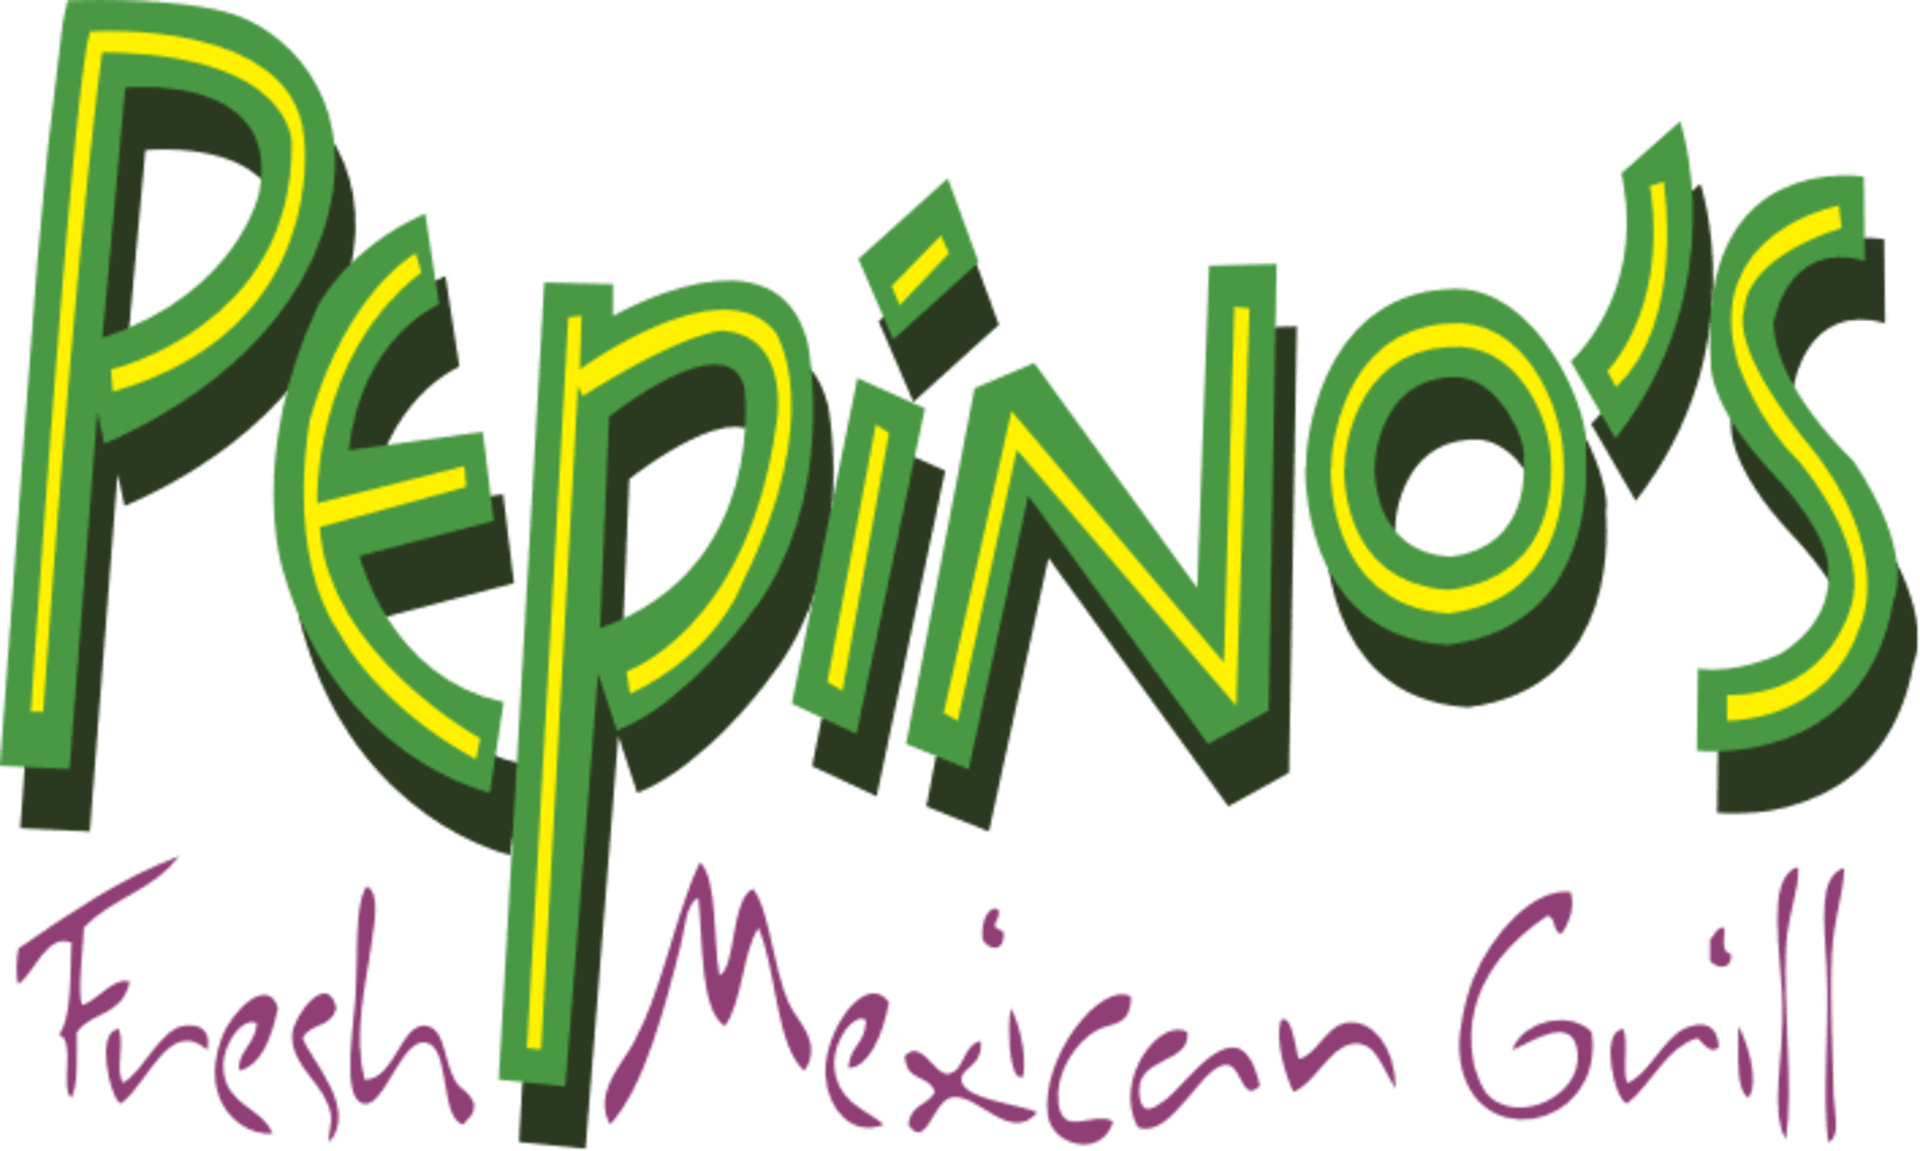 pepino's fresh mexican grill logo